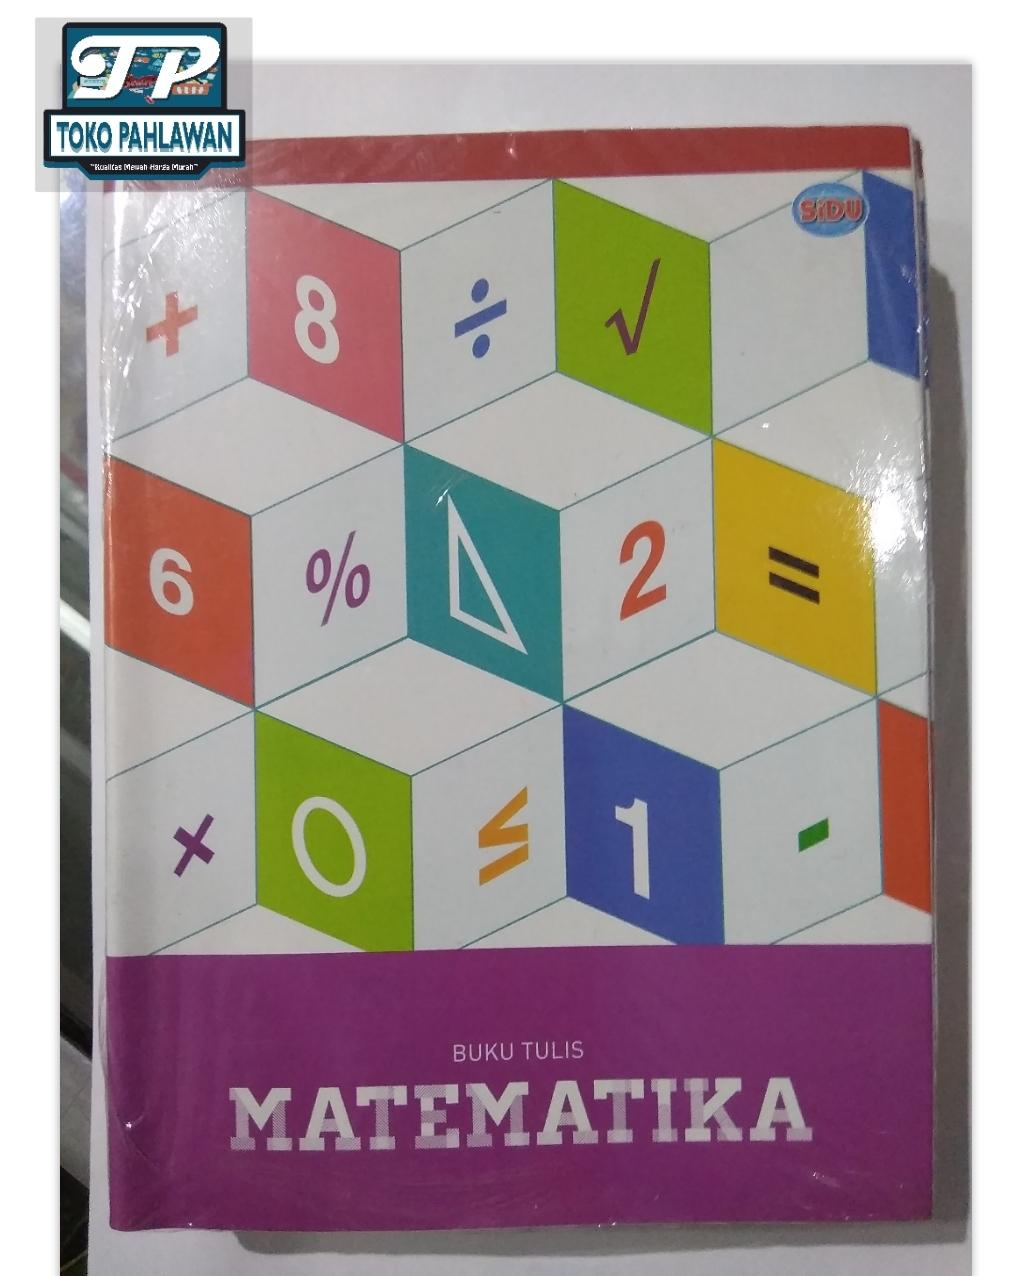 Buku Tulis Matematika Kotak-kotak SiDu 1 pak 36 lembar / atk / pulpen / kotak / pensil / bolpoint / sekolah / sd / smp / anak / tipex / penggaris / penghapus / ujian / kantor / joyko / standard / kiki / lukis / gambar /